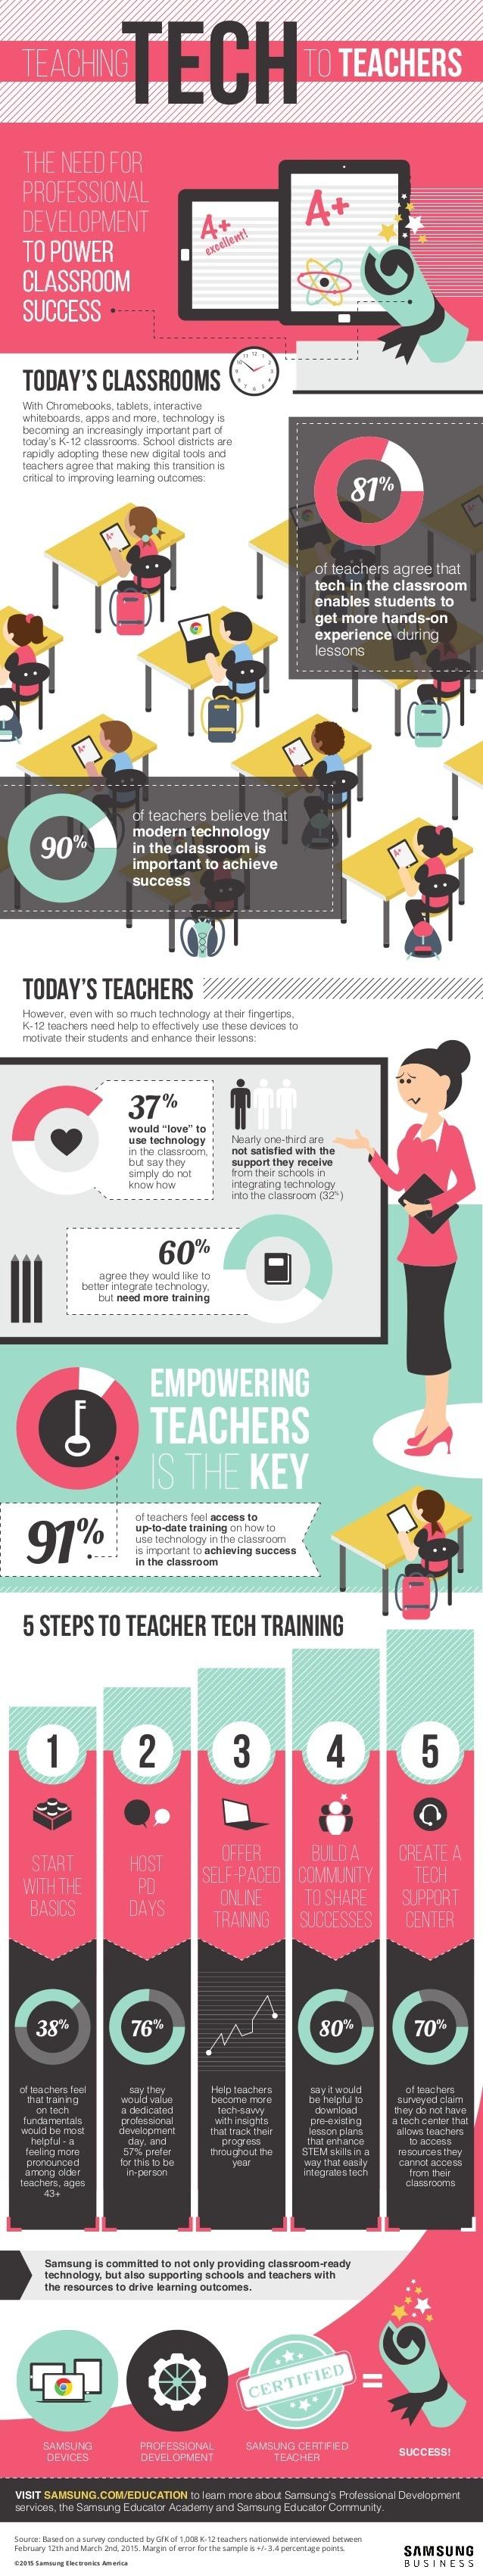 Teaching Tech to Teachers Infographic